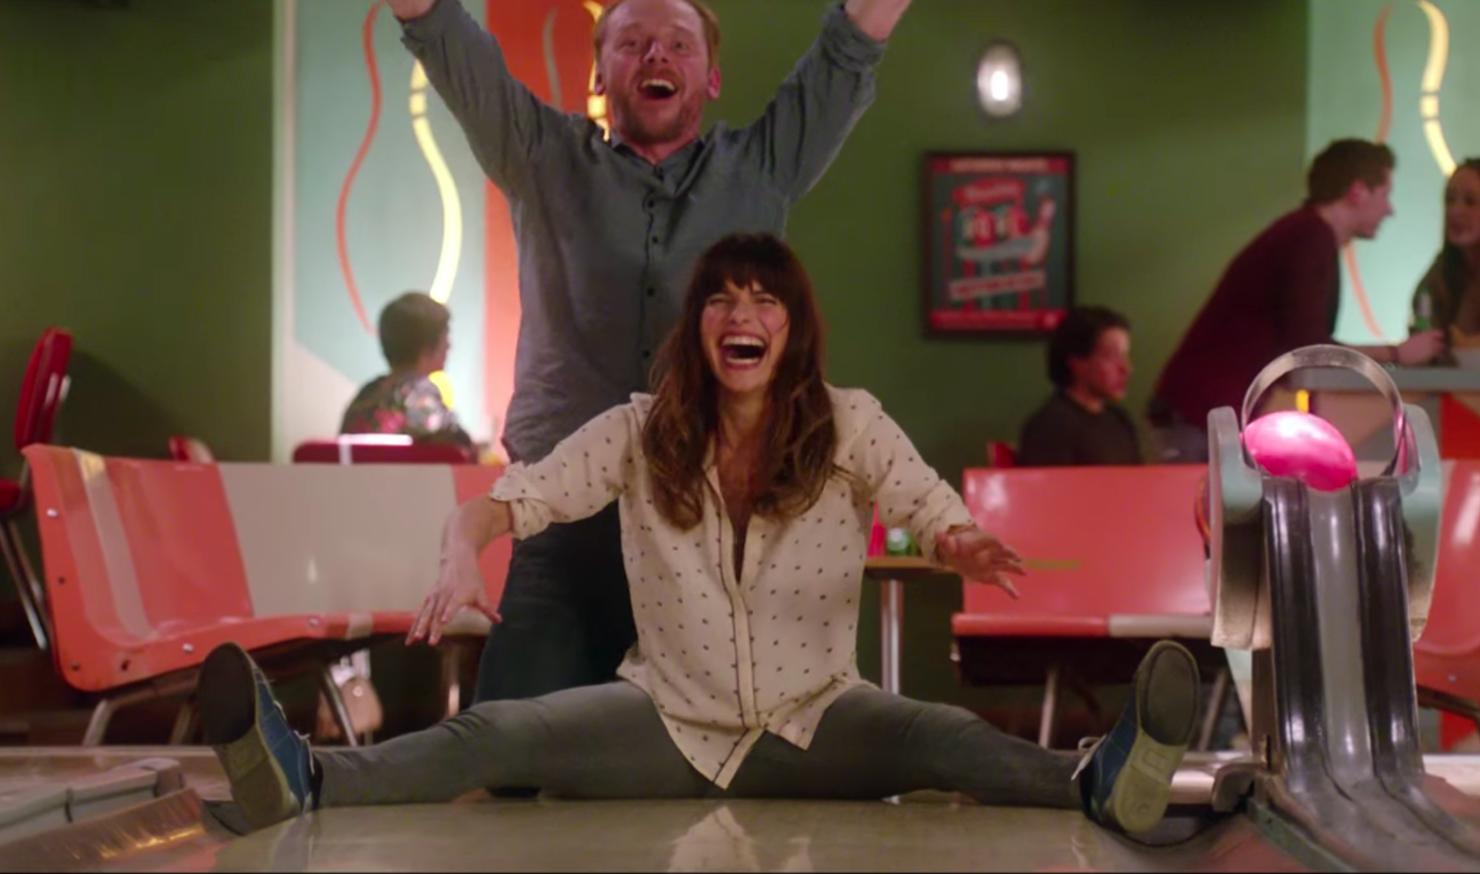 11 Feminist Raunchy Comedies To Watch On Netflix Movies Watchlist